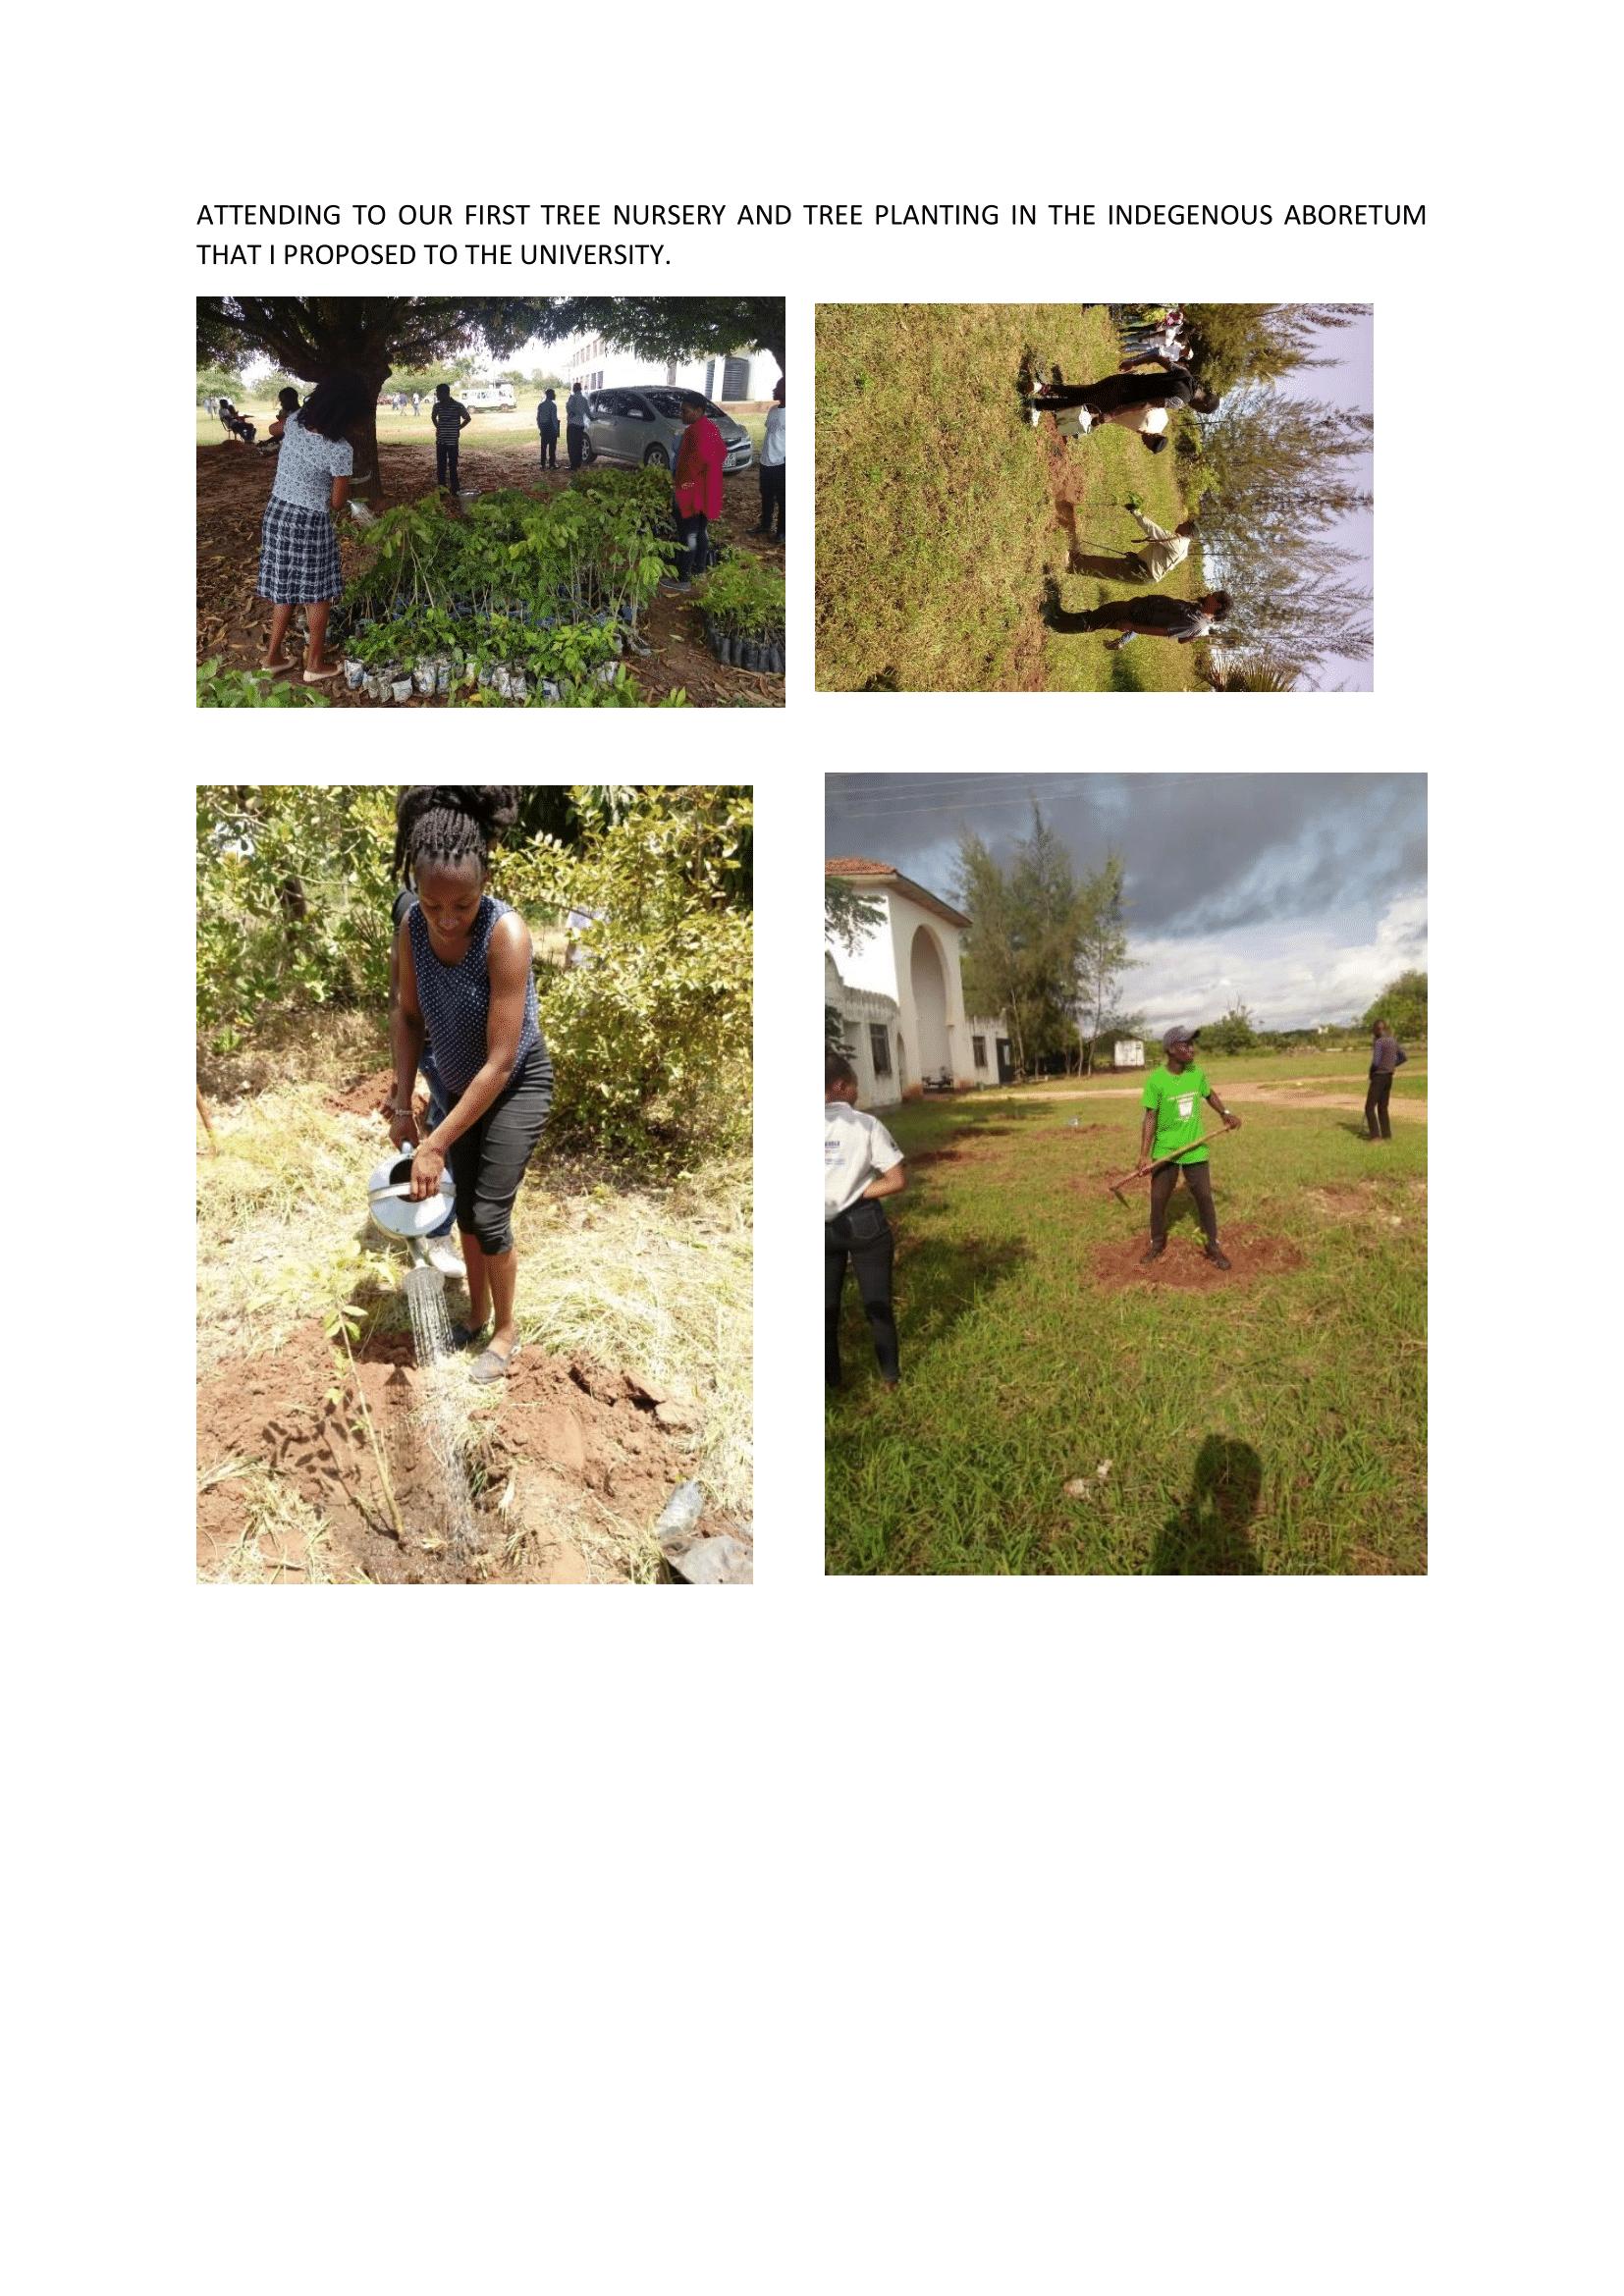 CarolineN_conserving nature and creating awareness-in-kenya - caroline njeri-3.png